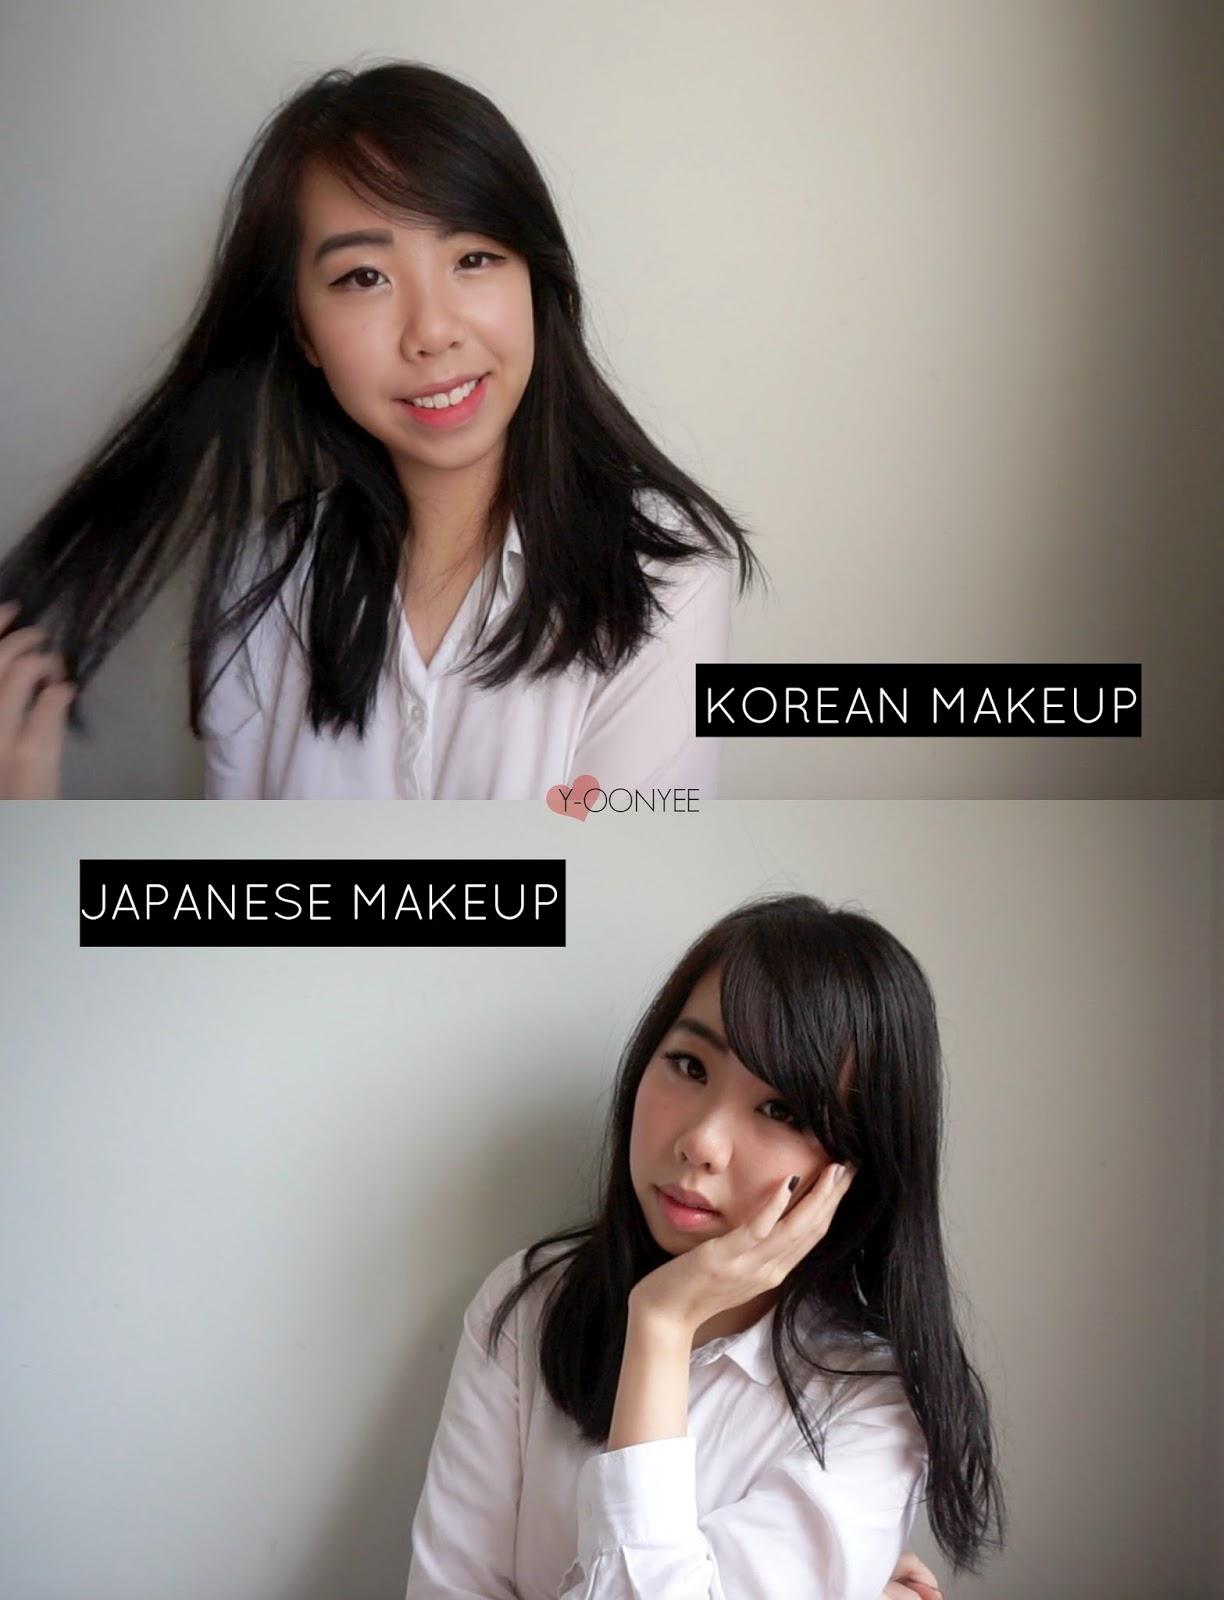 korean vs japanese makeup | before and after makeup transformation